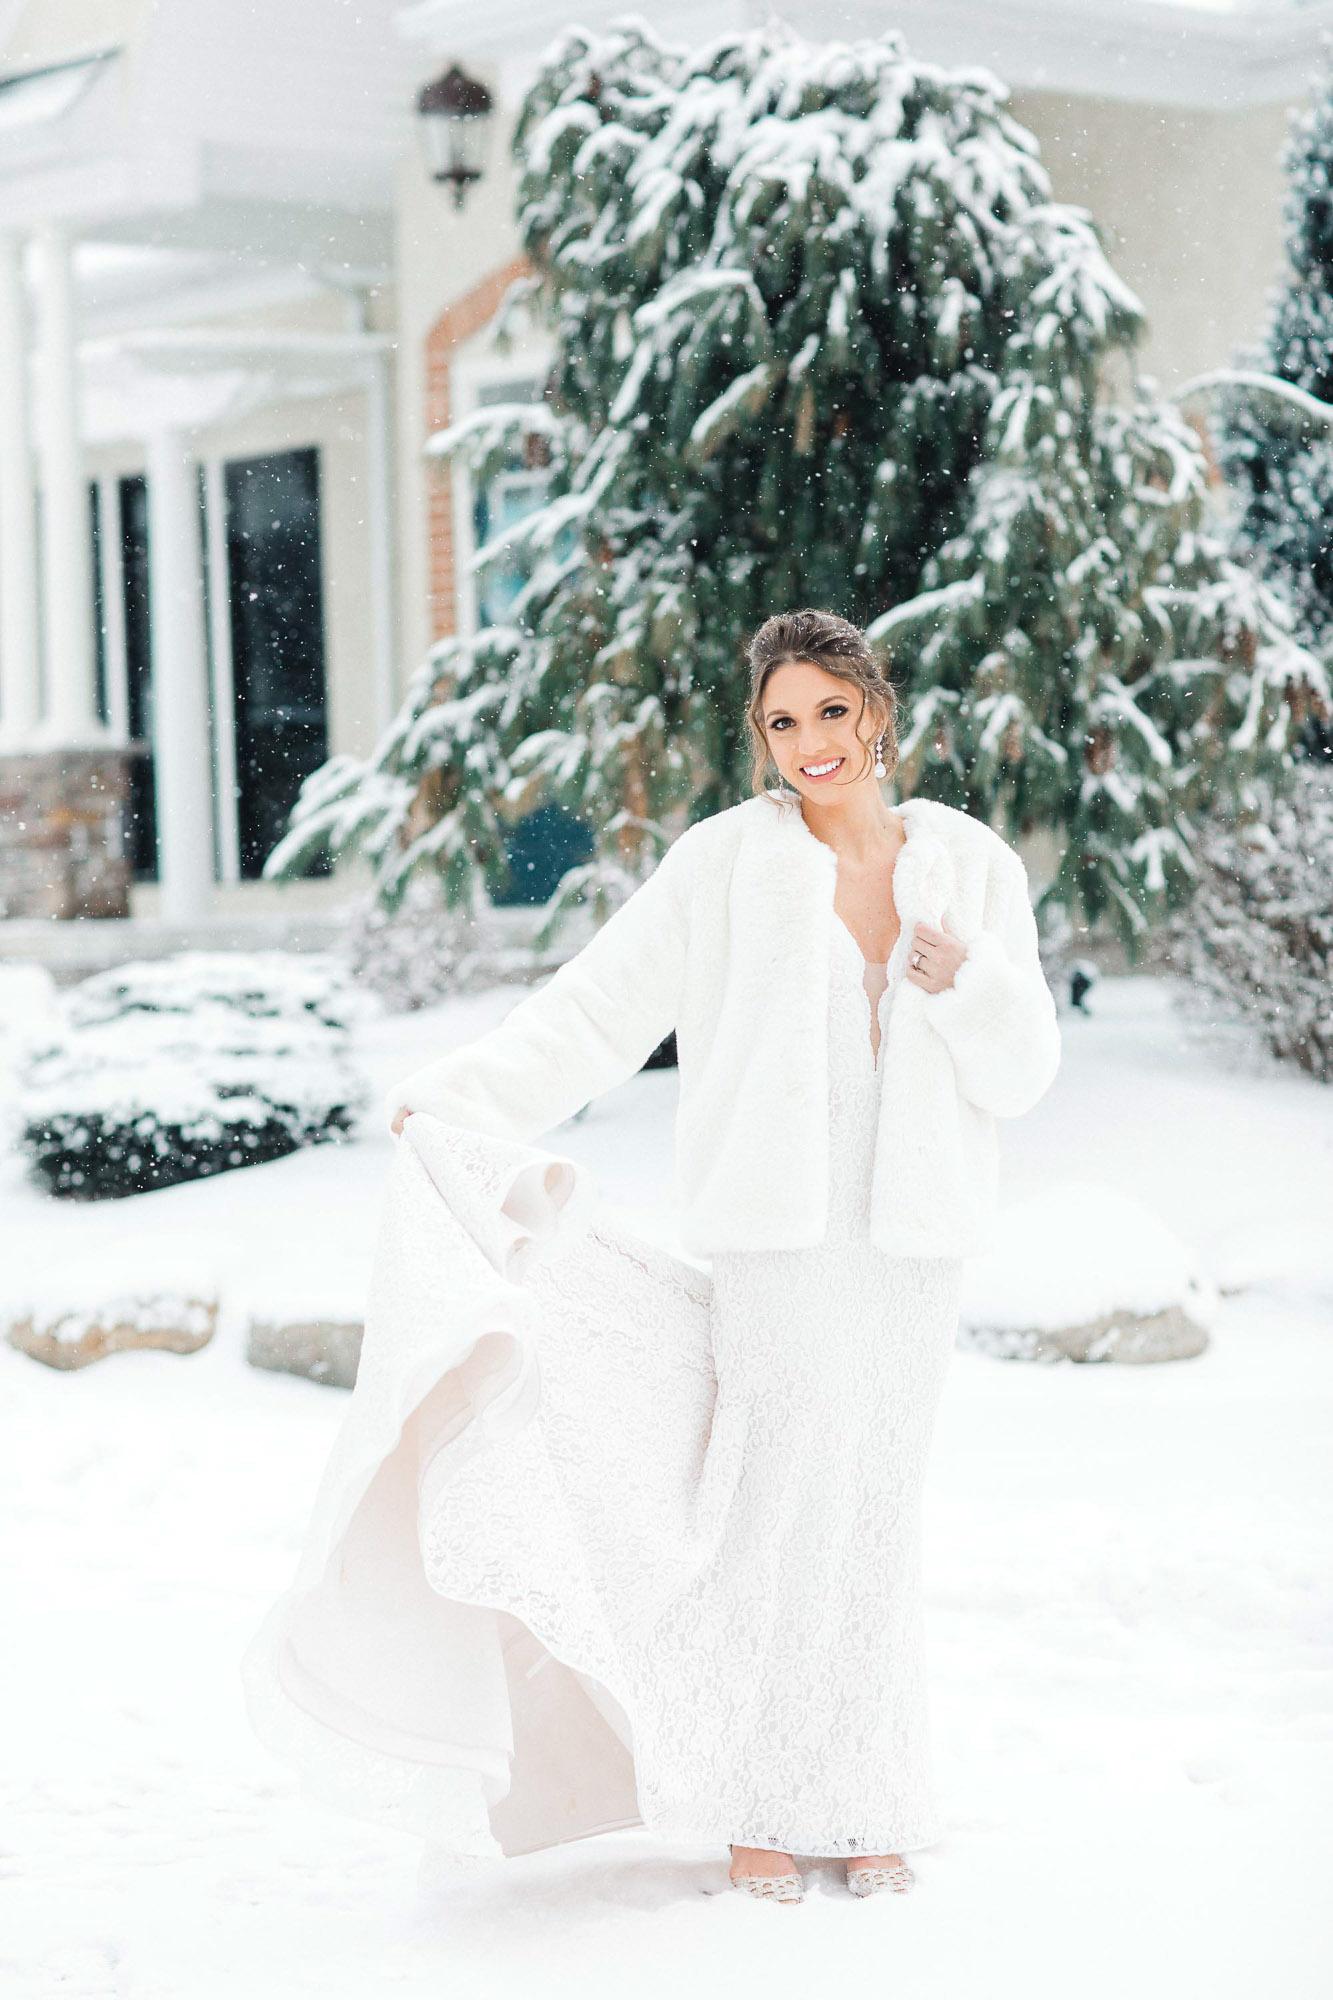 snowy-sand-springs-country-club-drums-pa-christmas-wedding-24141.jpg